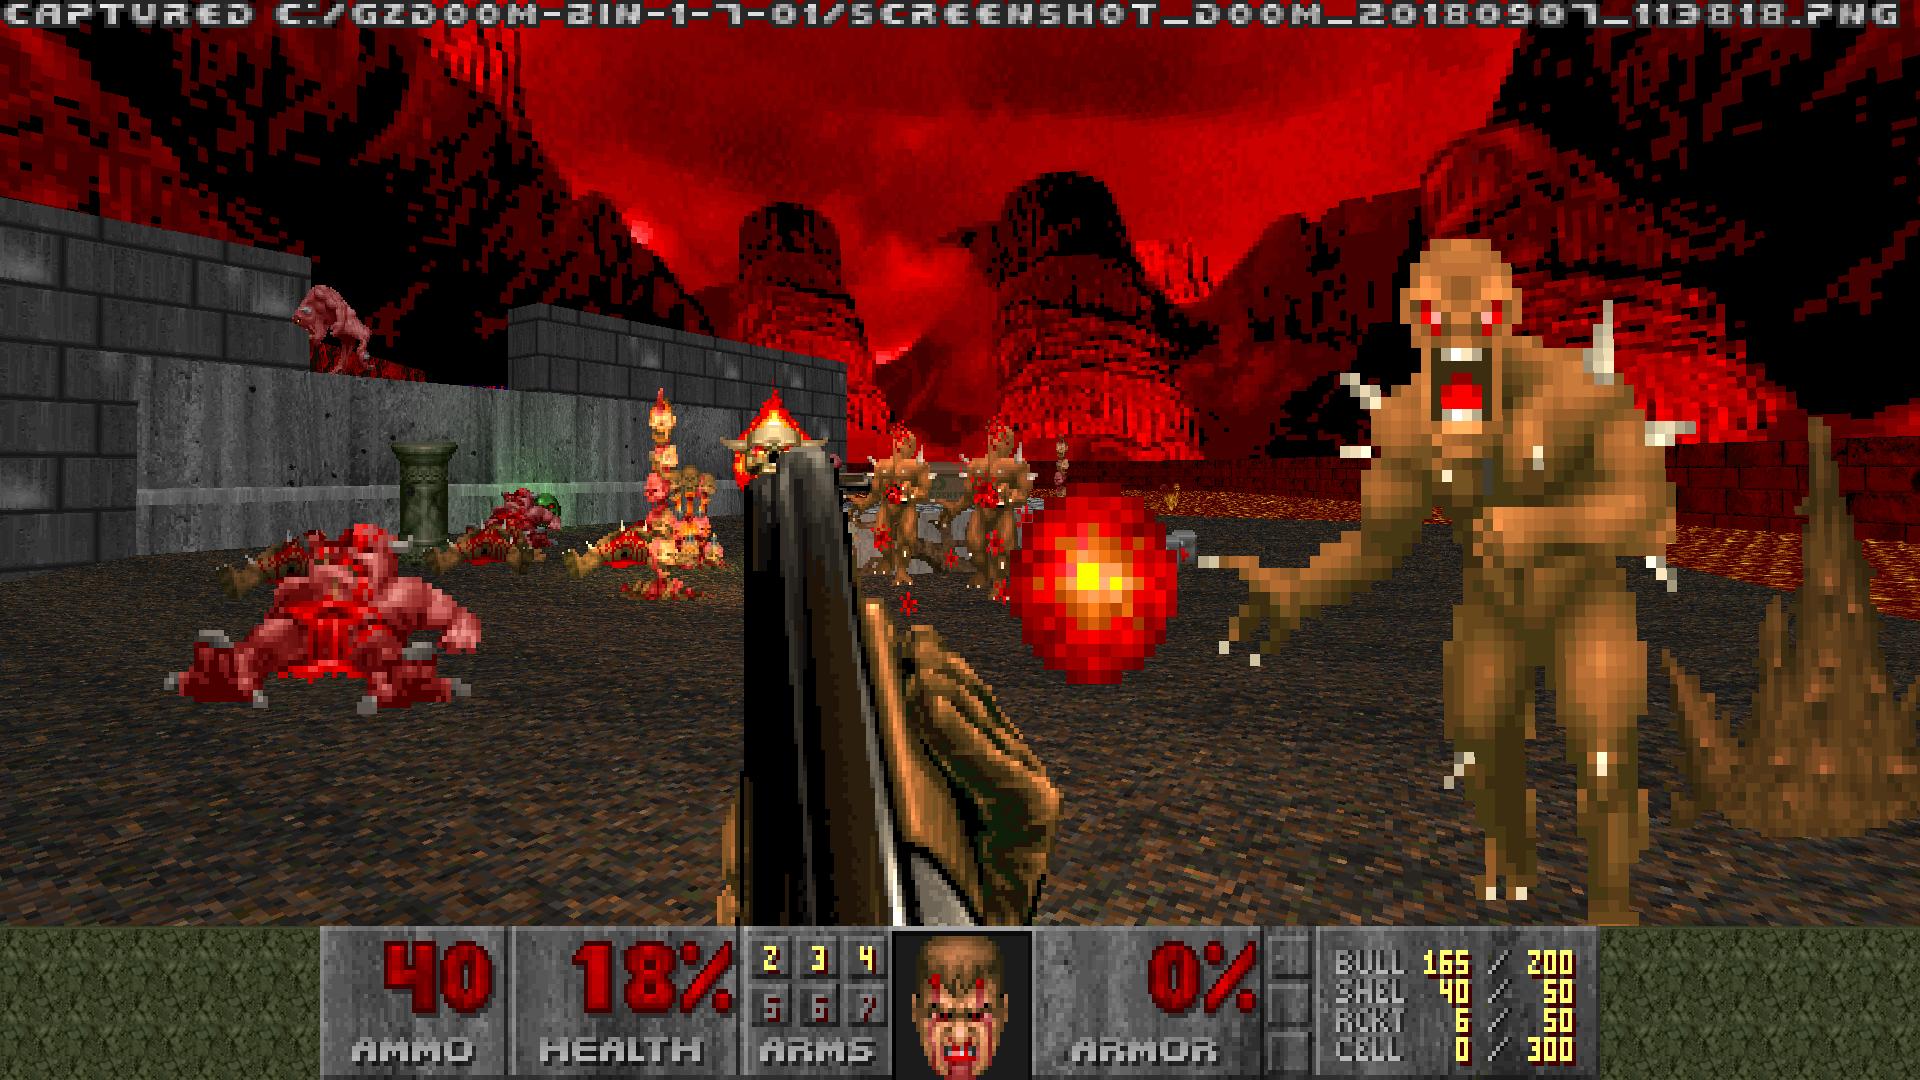 Super Shotgun in The Ultimate Doom addon - Mod DB